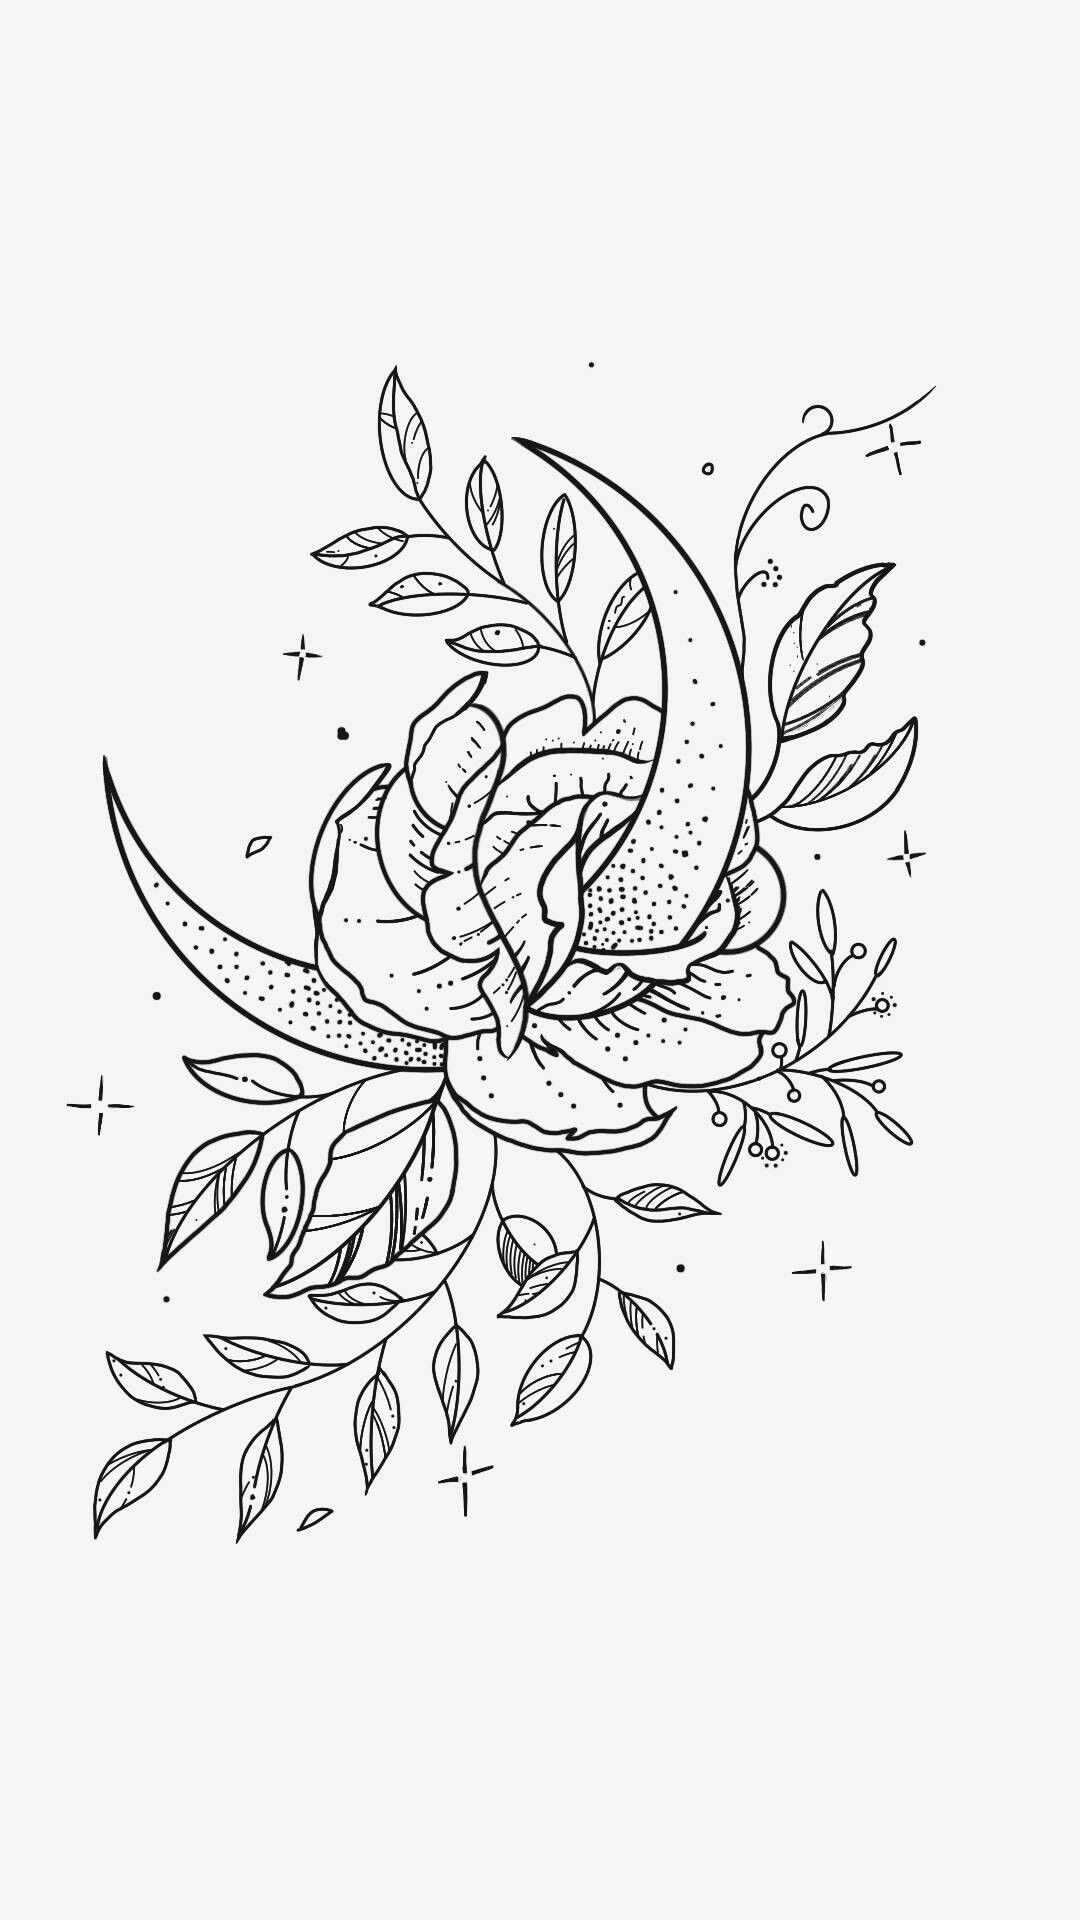 Art Tattoo Flower Tattoo Stencil Outline Tattoo Outline Drawing Tattoo Stencils Tattoo designs drawing wallpaper